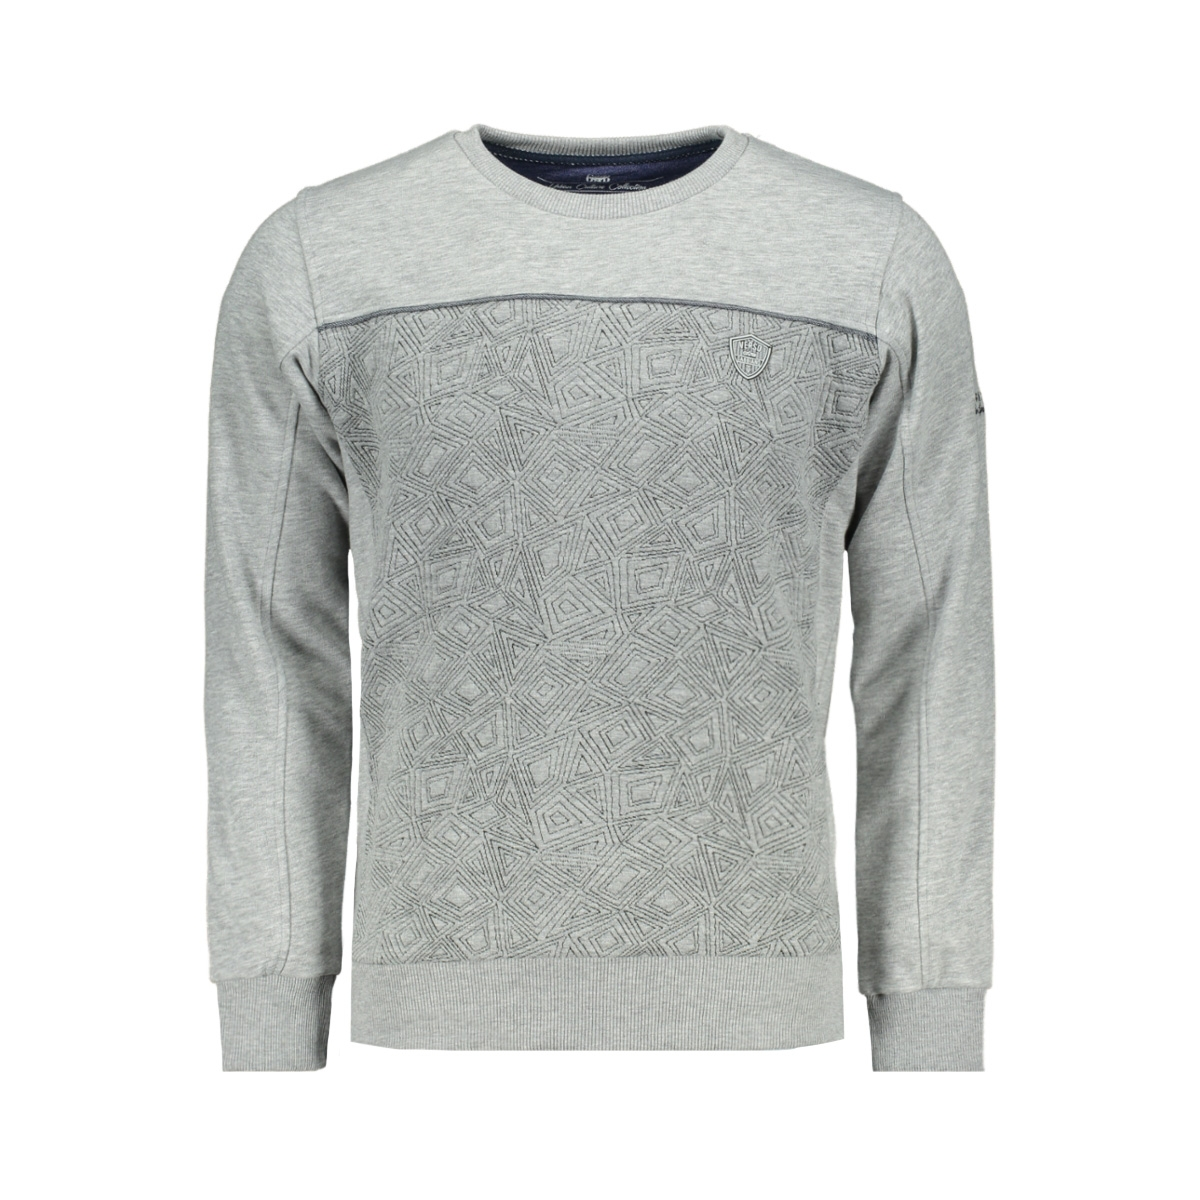 76110 gabbiano sweater grey